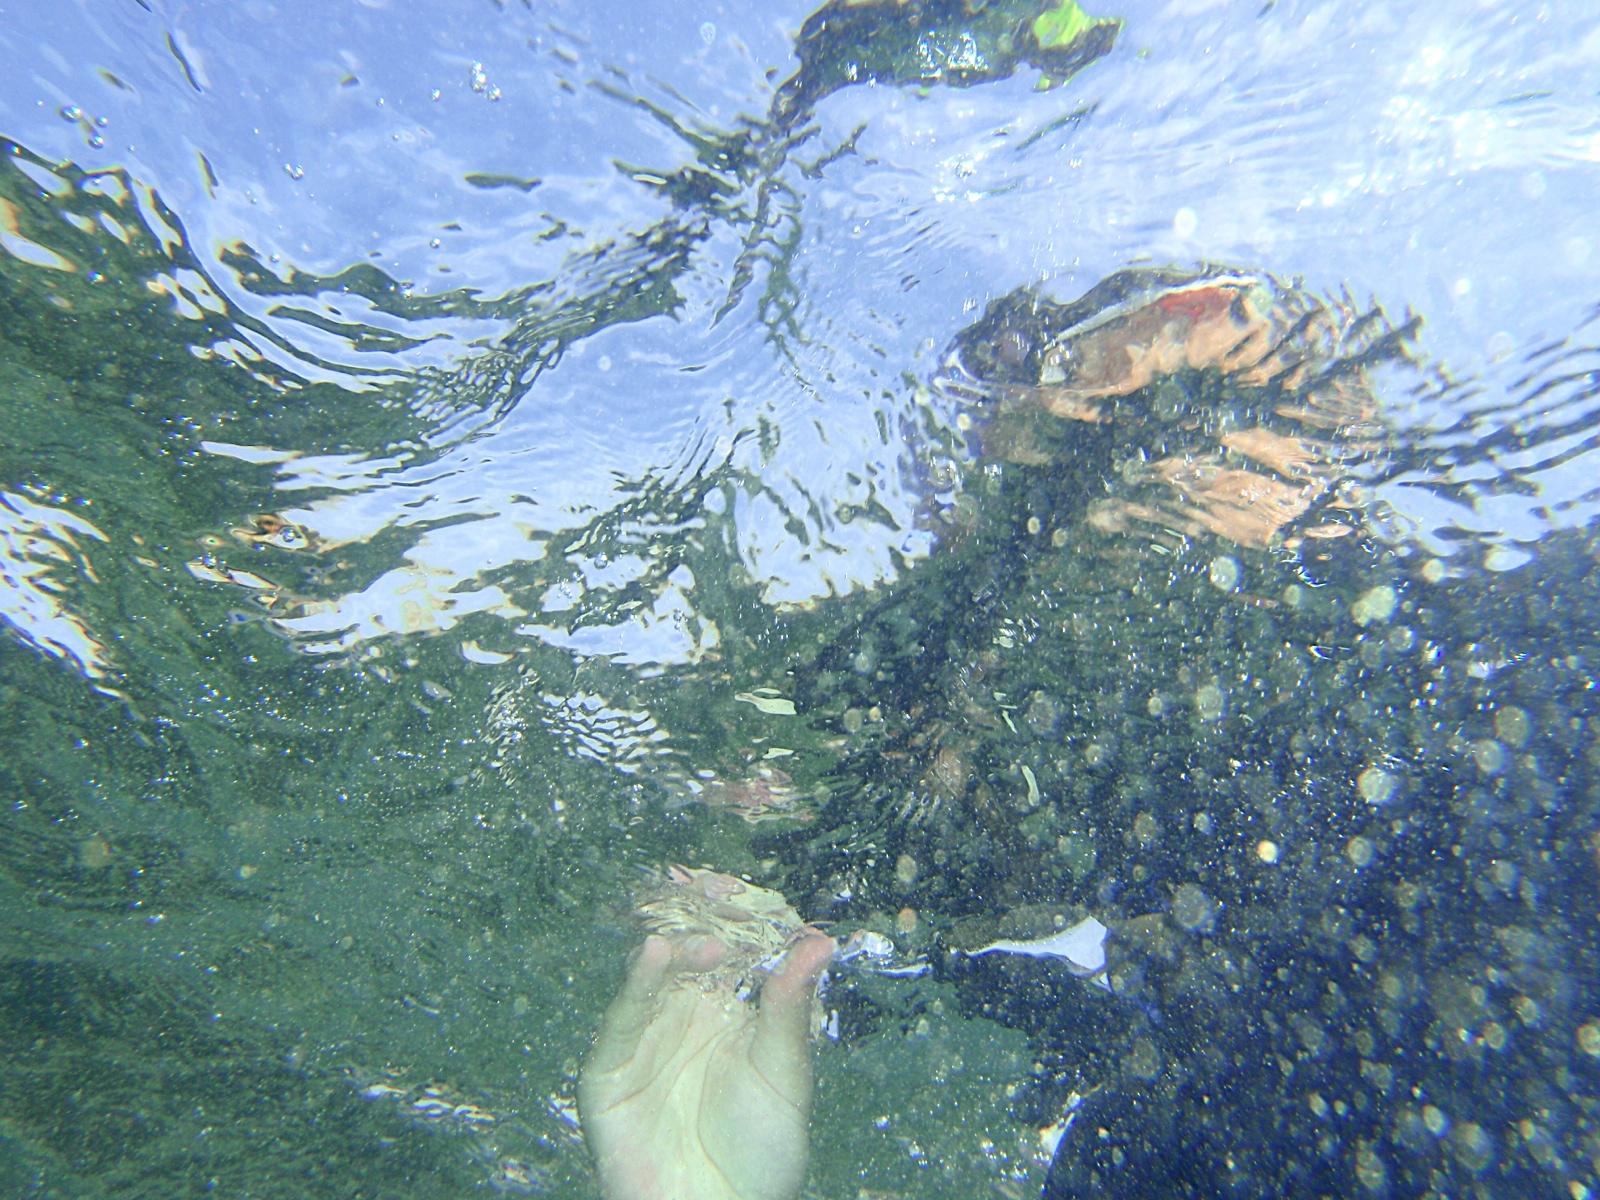 Monogràfic Marí 2010 - P5300343.JPG